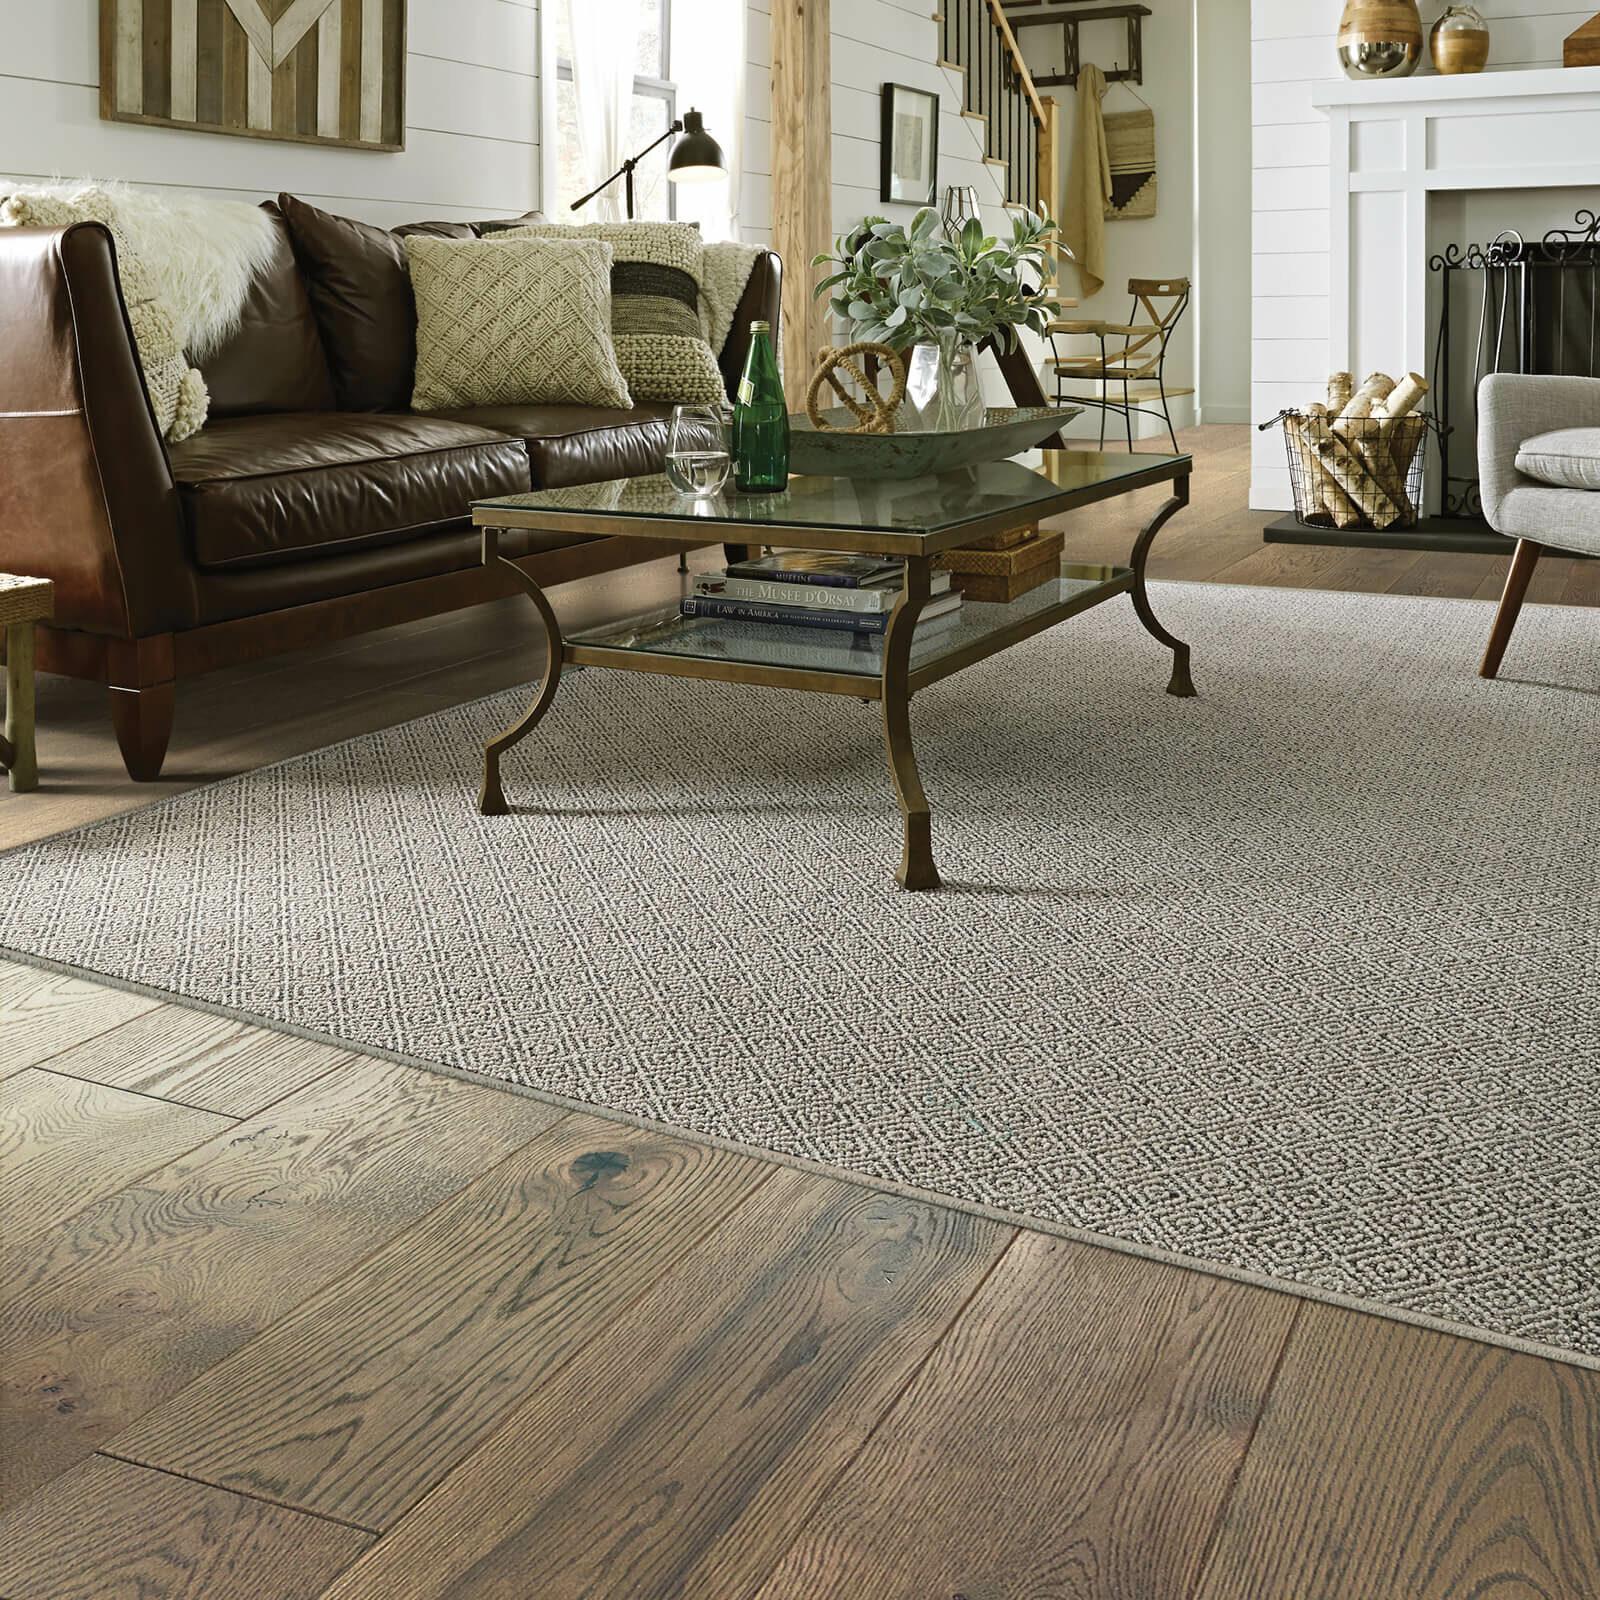 Living room hardwood flooring   Flooring 101